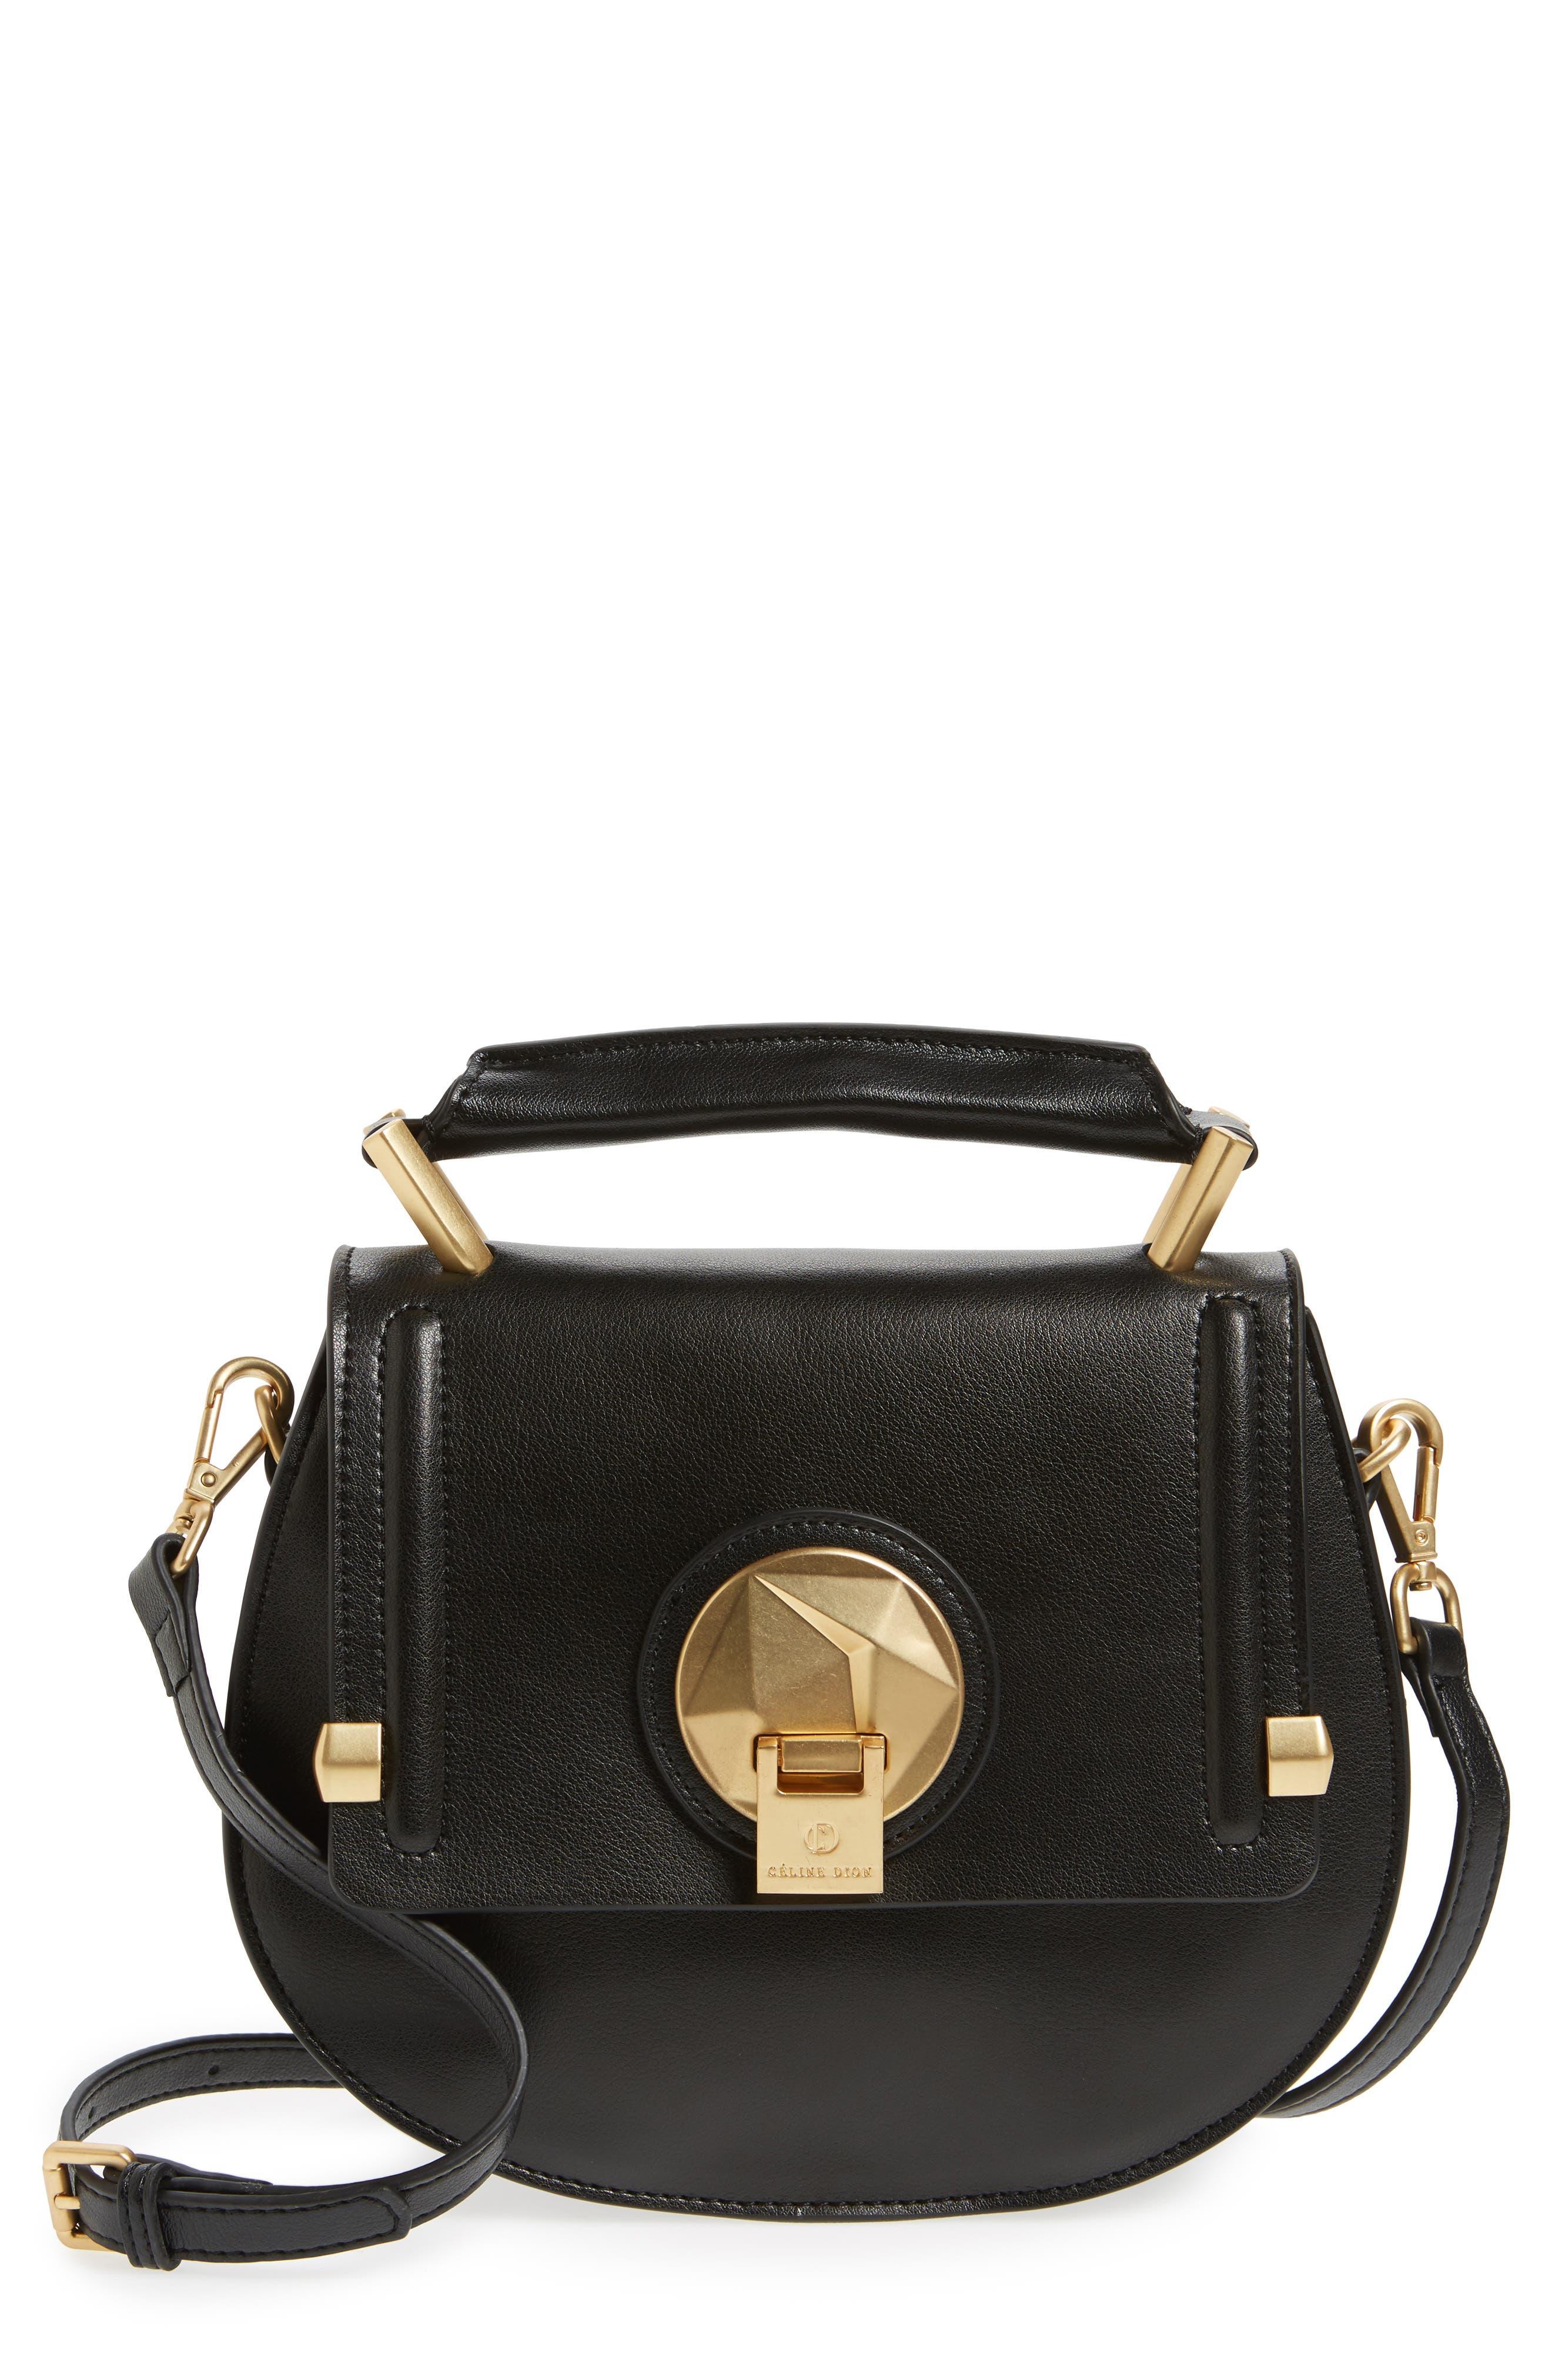 Alternate Image 1 Selected - Céline Dion Octave Leather Top Handle Satchel